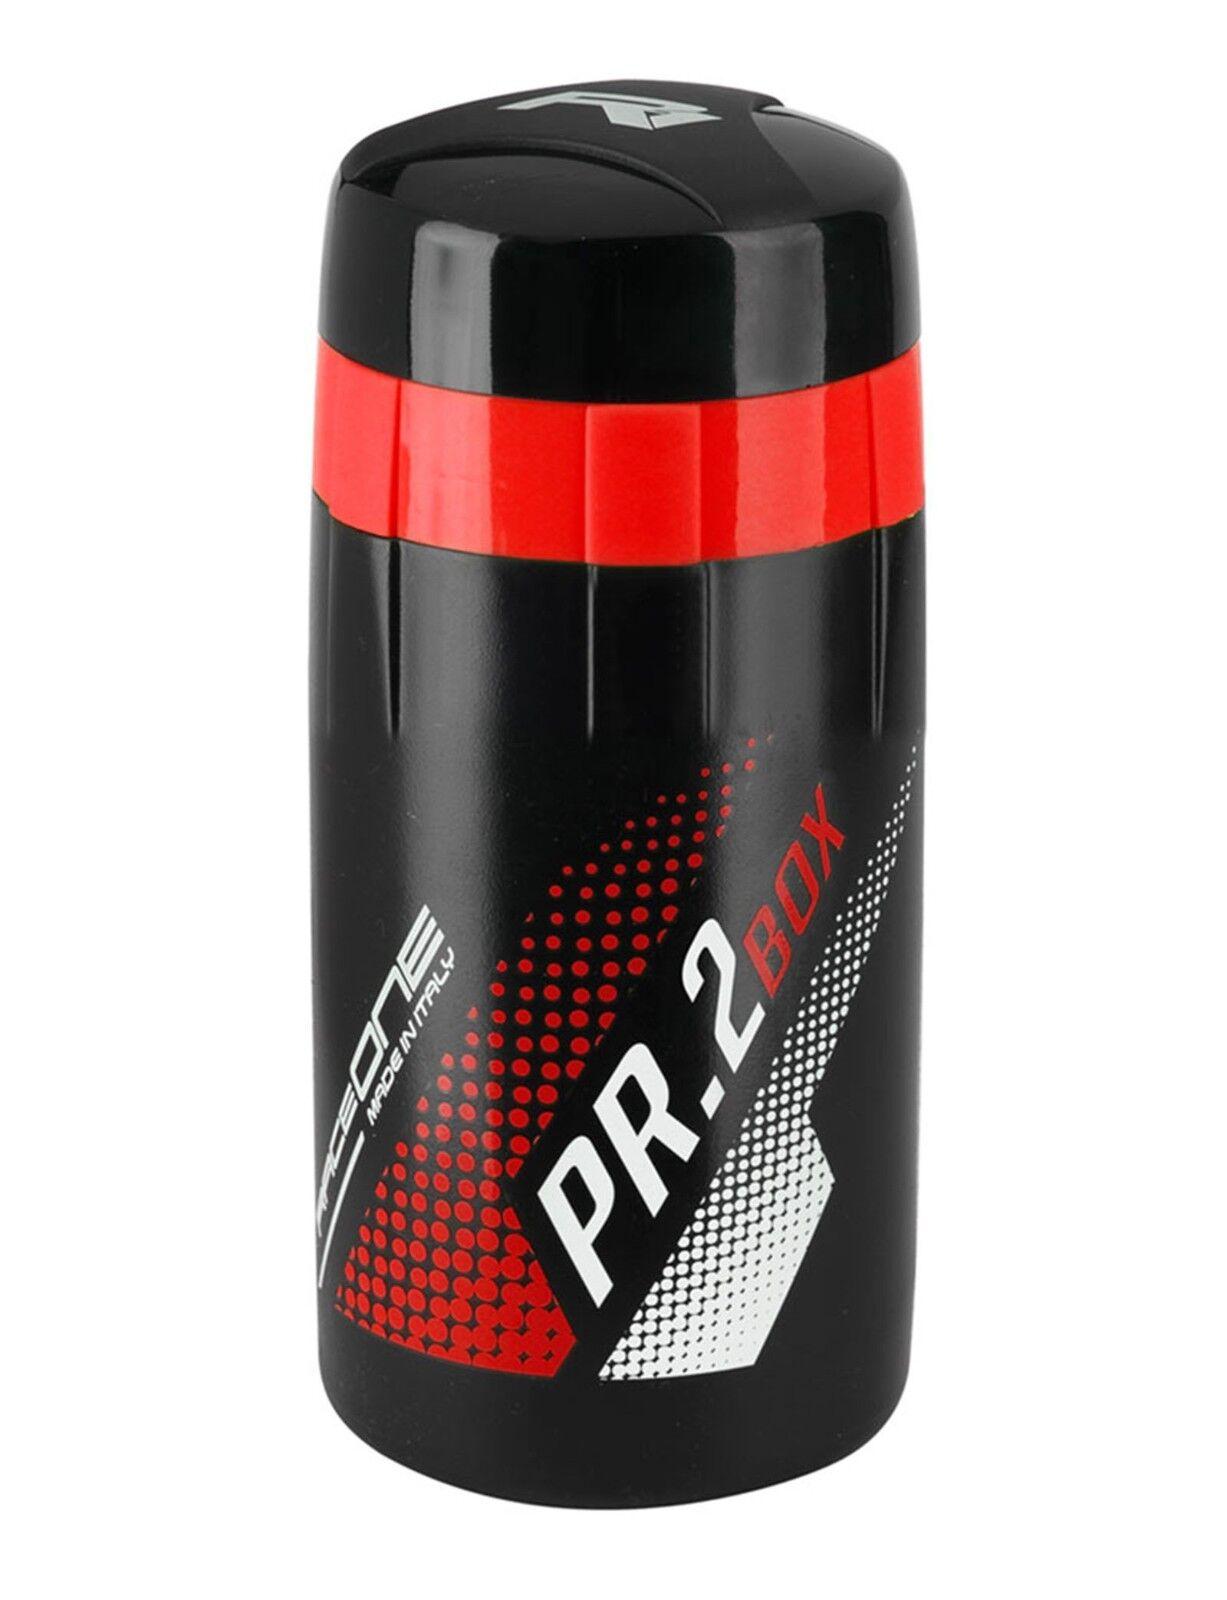 Bidon RACEONE PR2 BOX TOOLBOX para Herramientas de Bicicleta Negro Rojo 6297rj